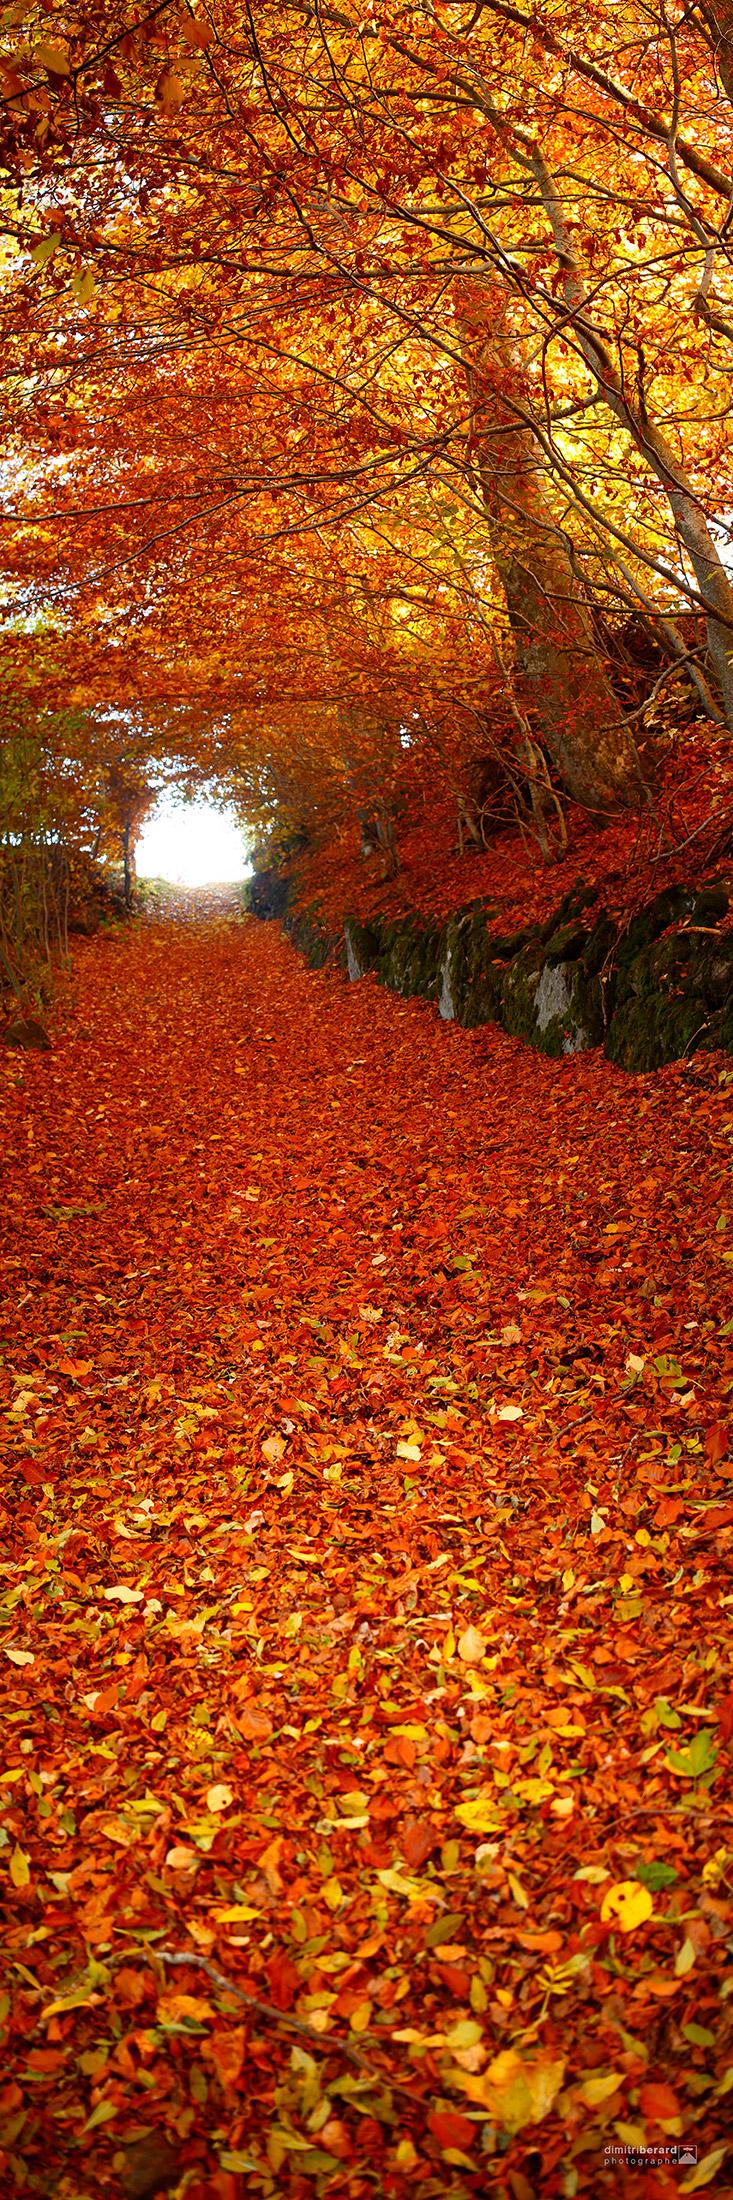 rivière-de-feuilles-II